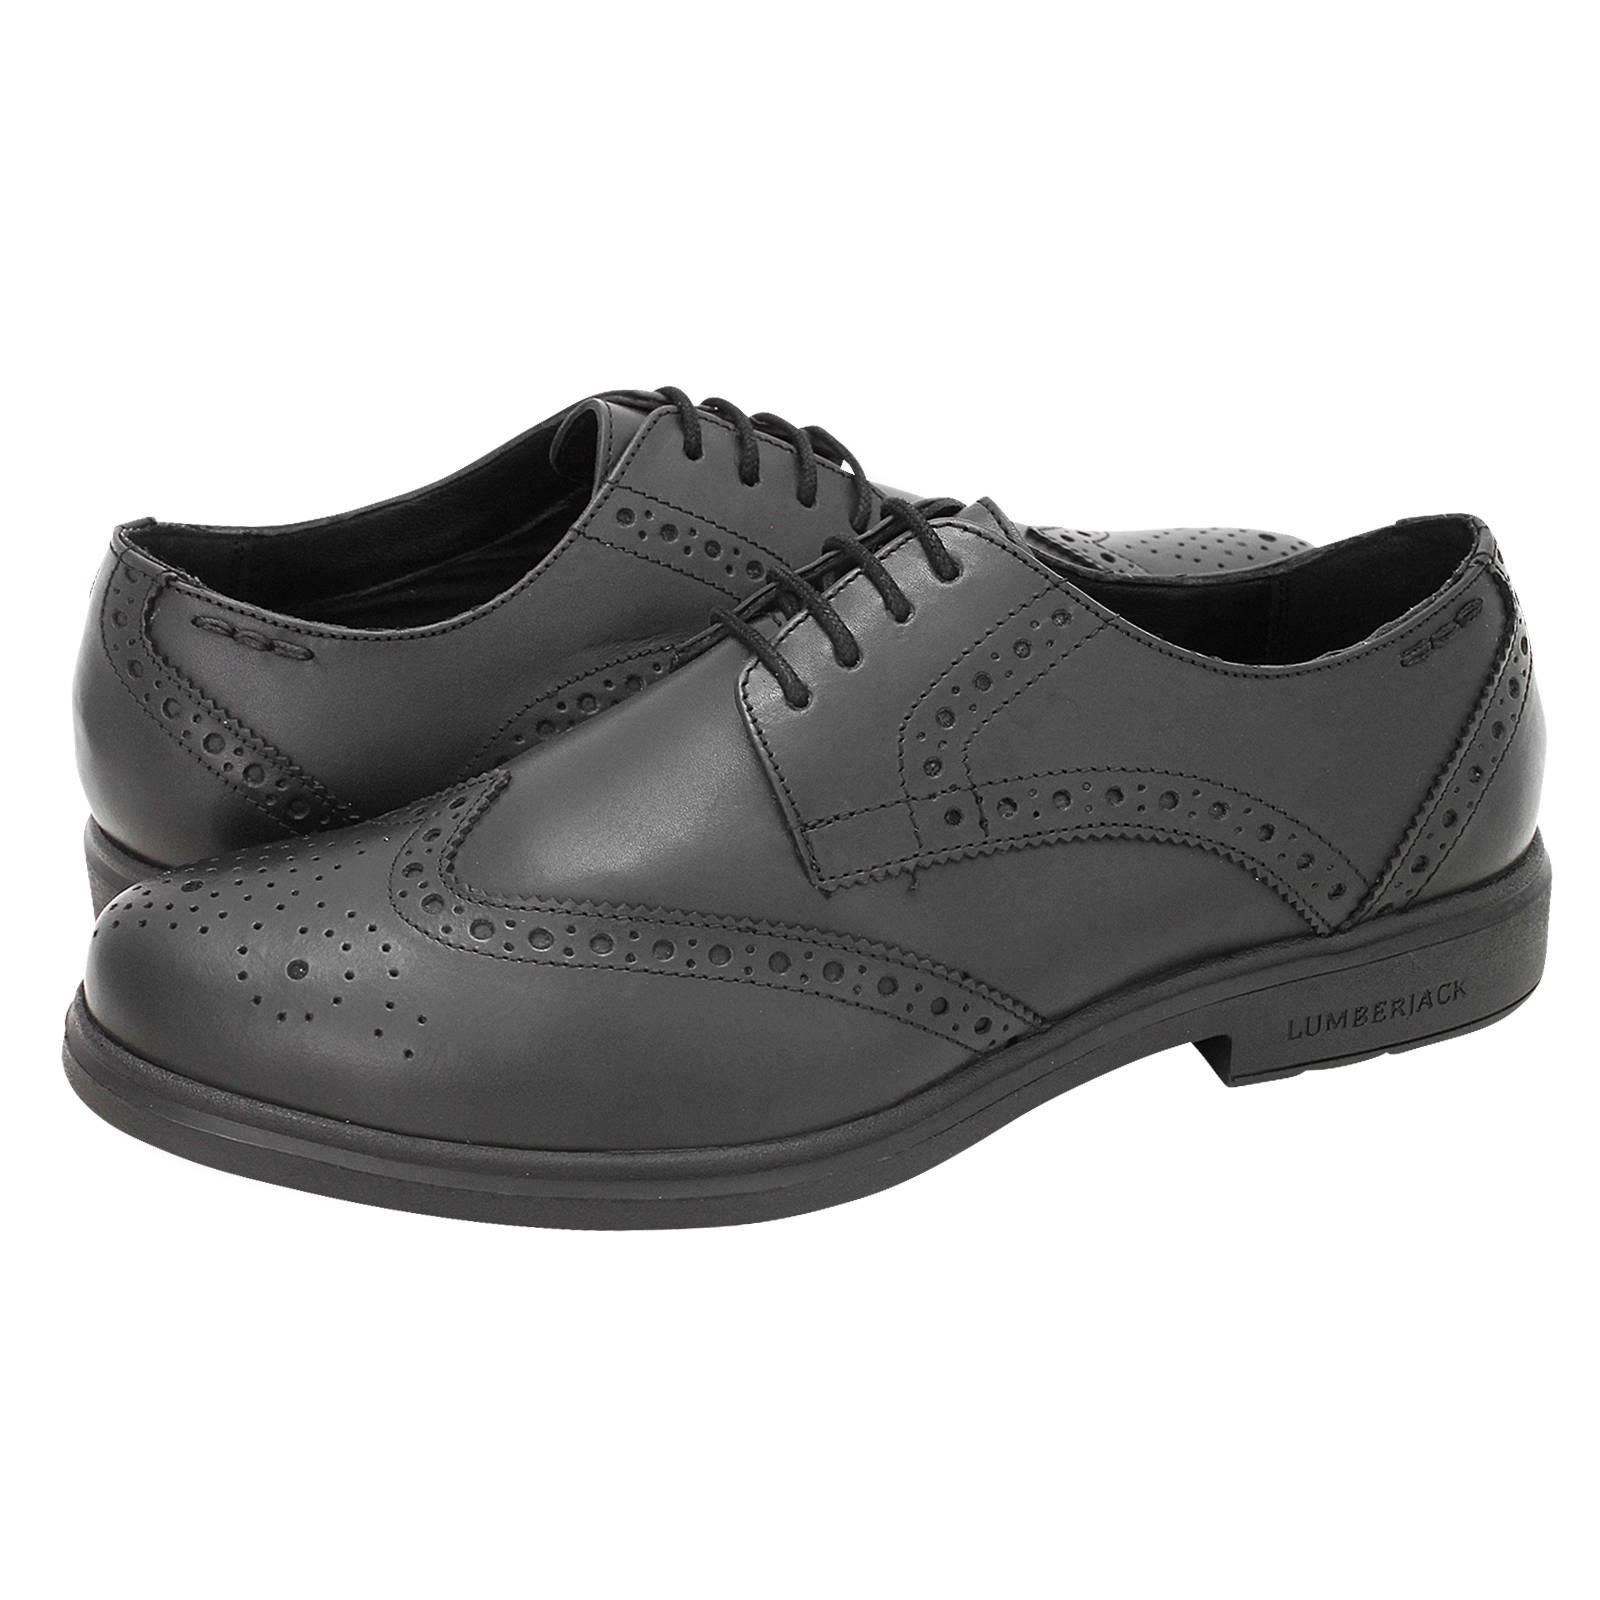 Utah Urban Derby Brogue - Ανδρικά δετά παπούτσια Lumberjack από ... cedee1731eb